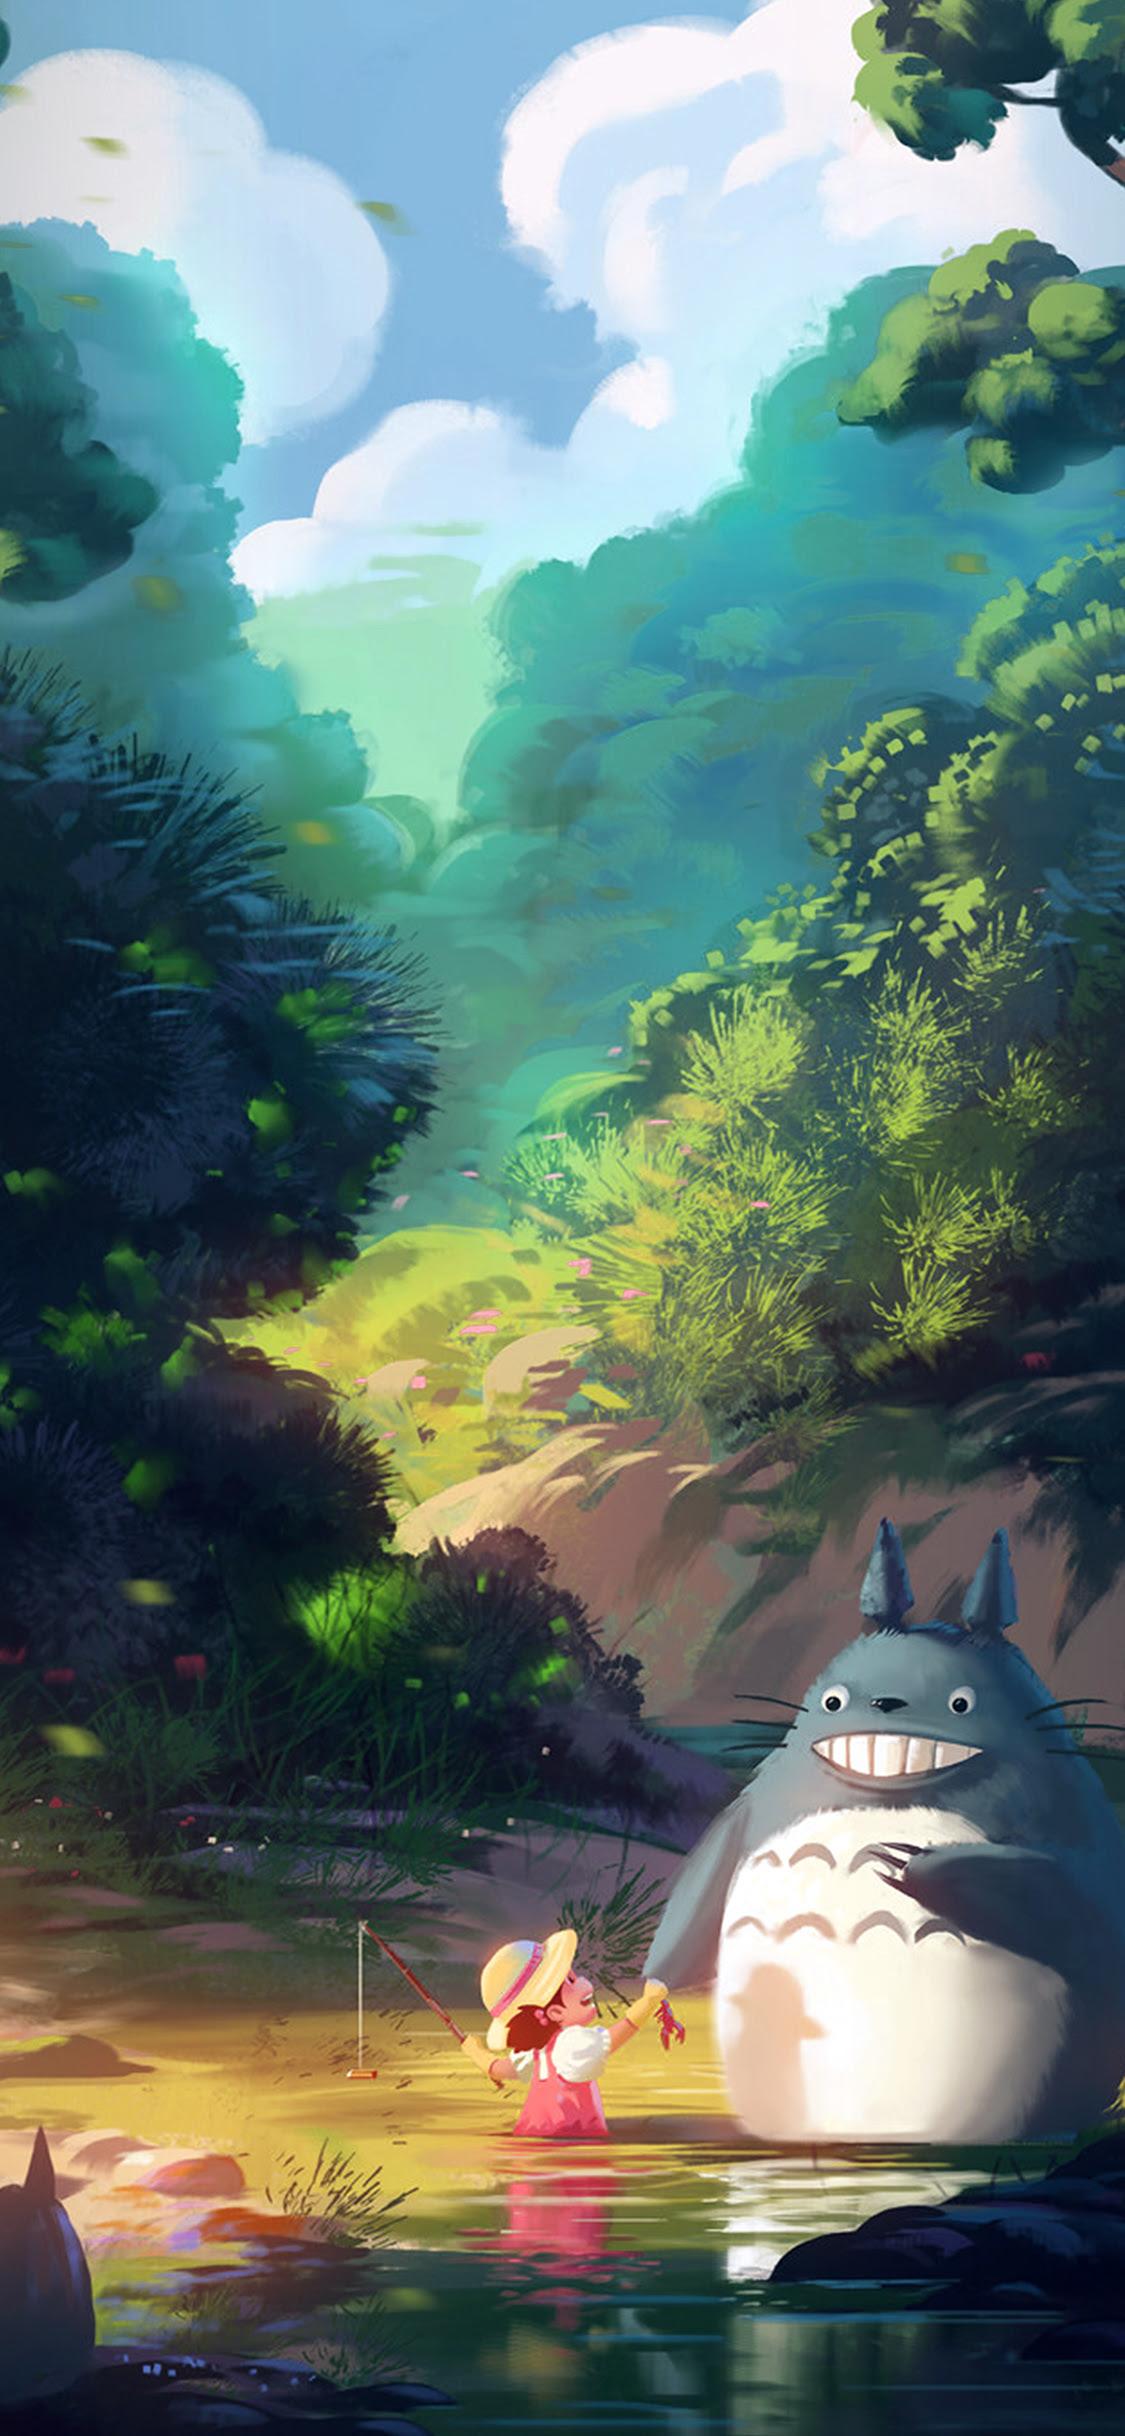 av34-totoro-anime-liang-xing-illustration-art-blue-wallpaper